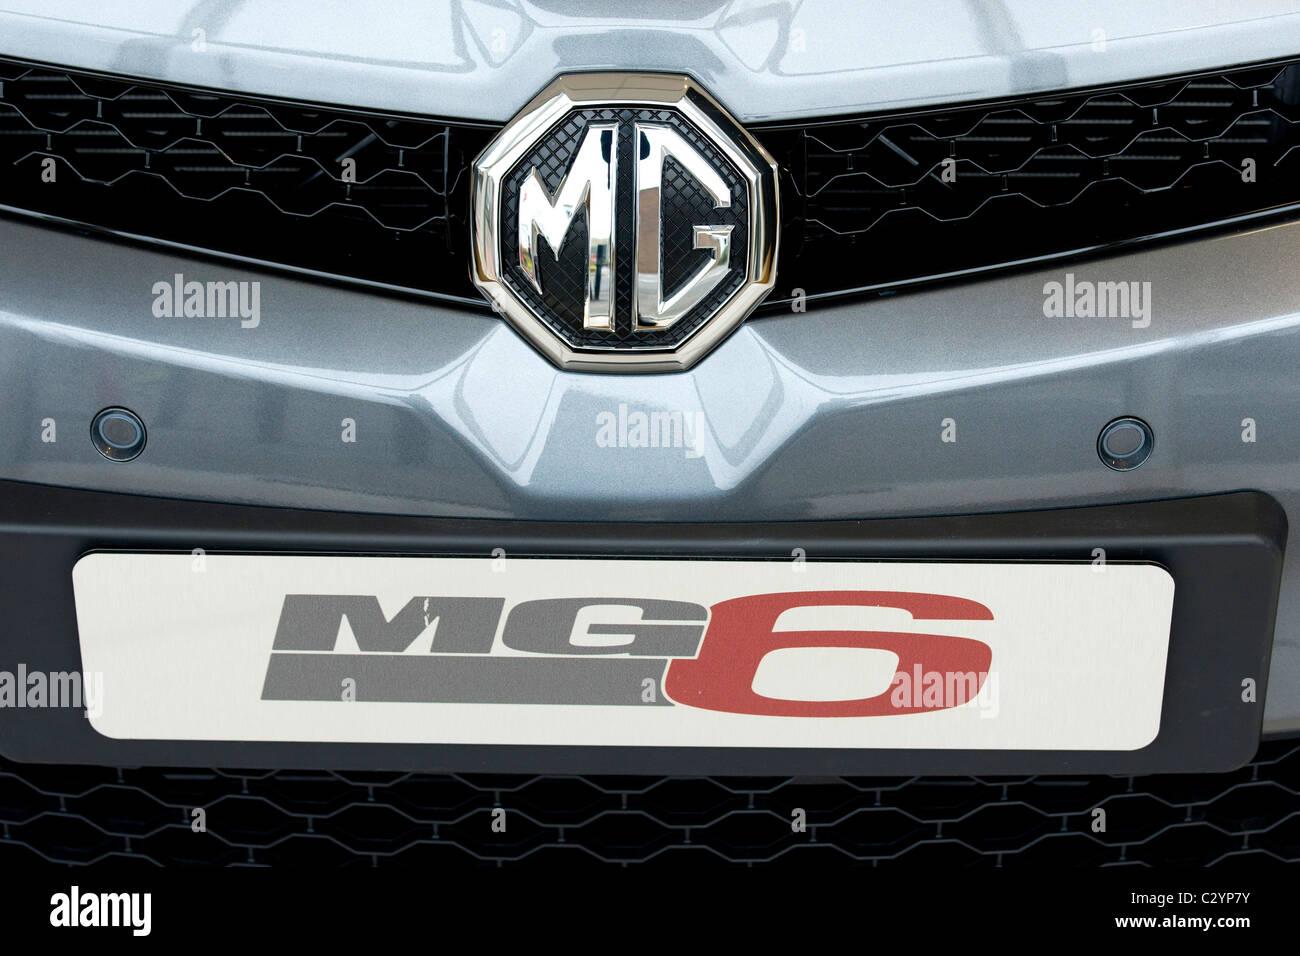 Launch day of the MG6 motor car in Longbridge Birmingham - Stock Image